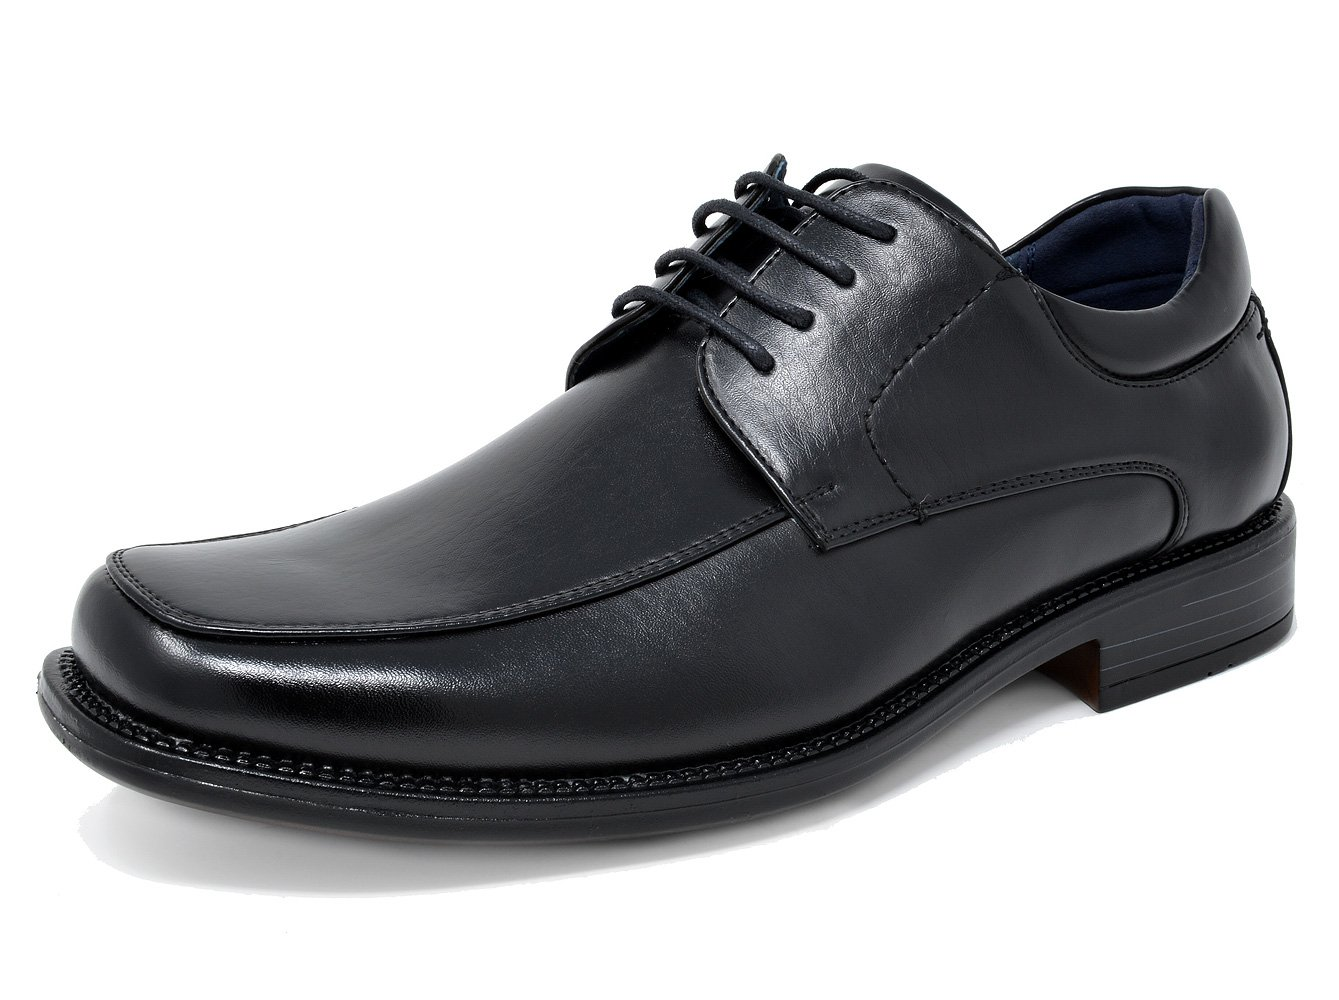 Bruno Marc Men's Goldman-01 Black Leather Lined Square Toe Dress Oxfords Shoes - 10 M US